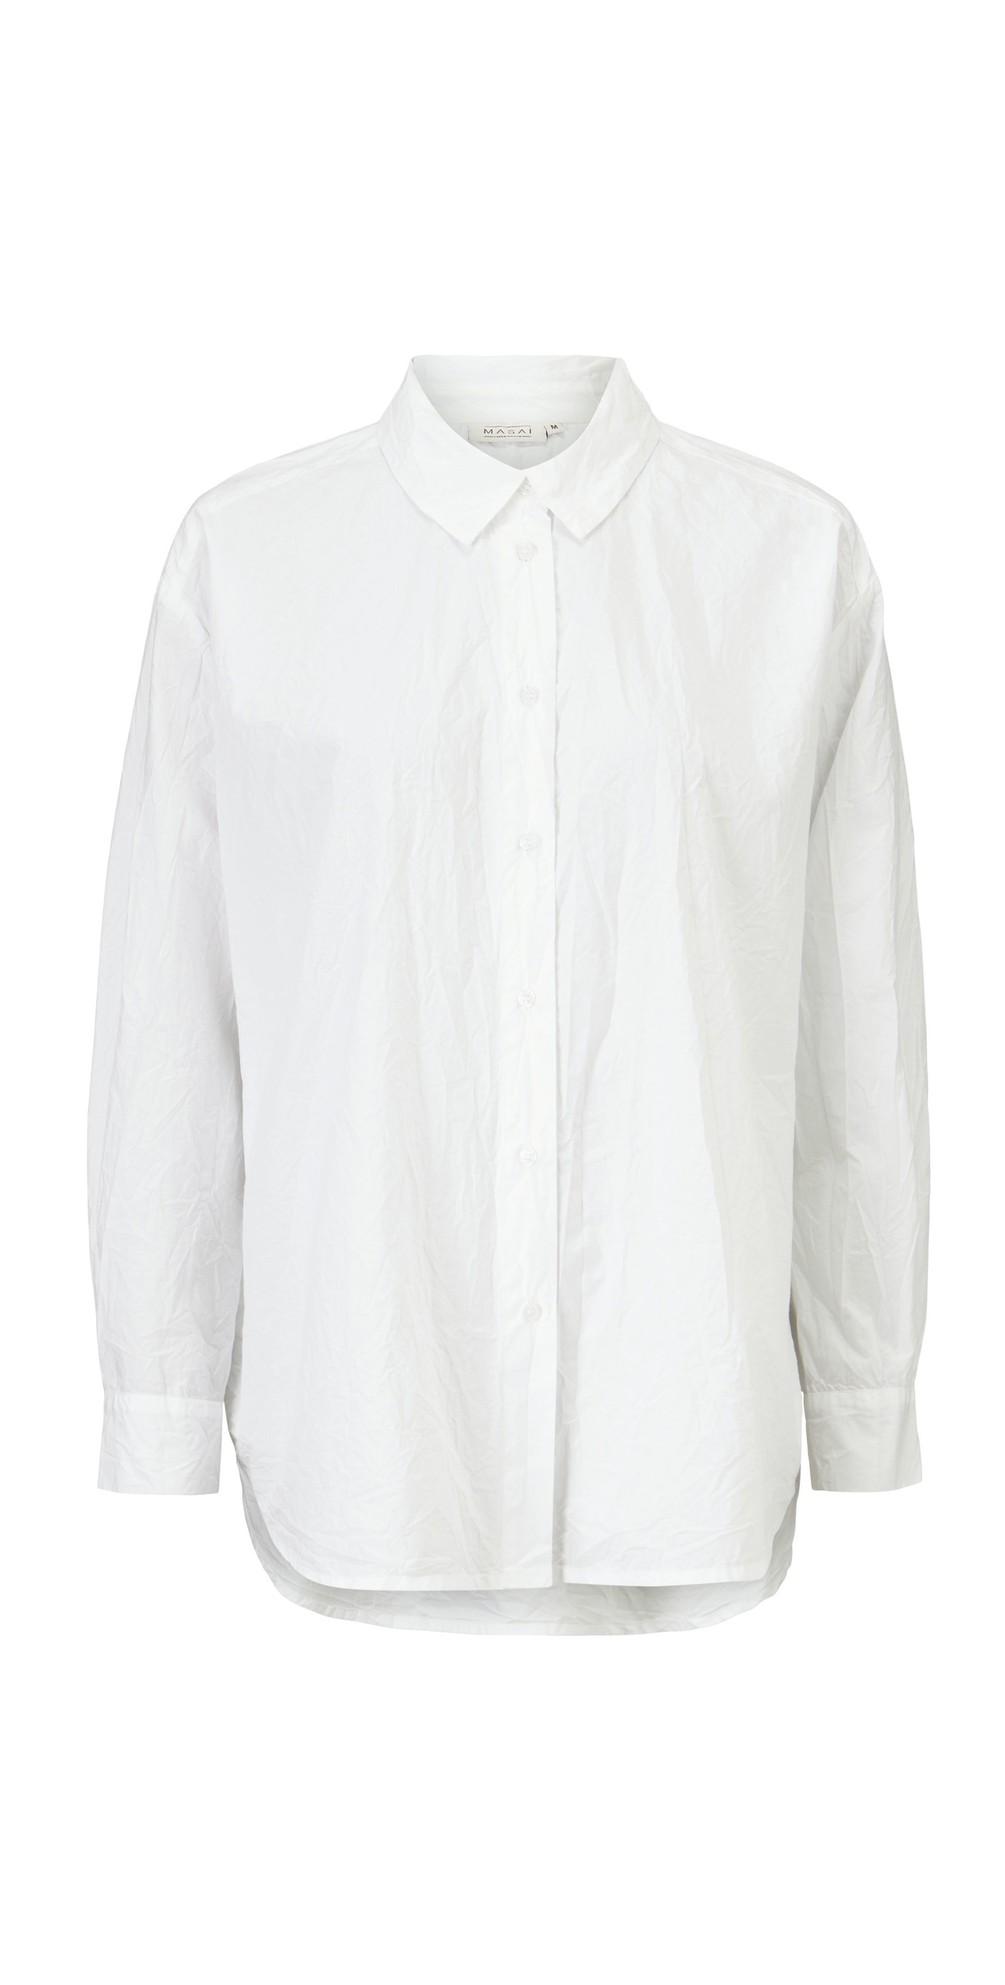 Inea Shirt main image